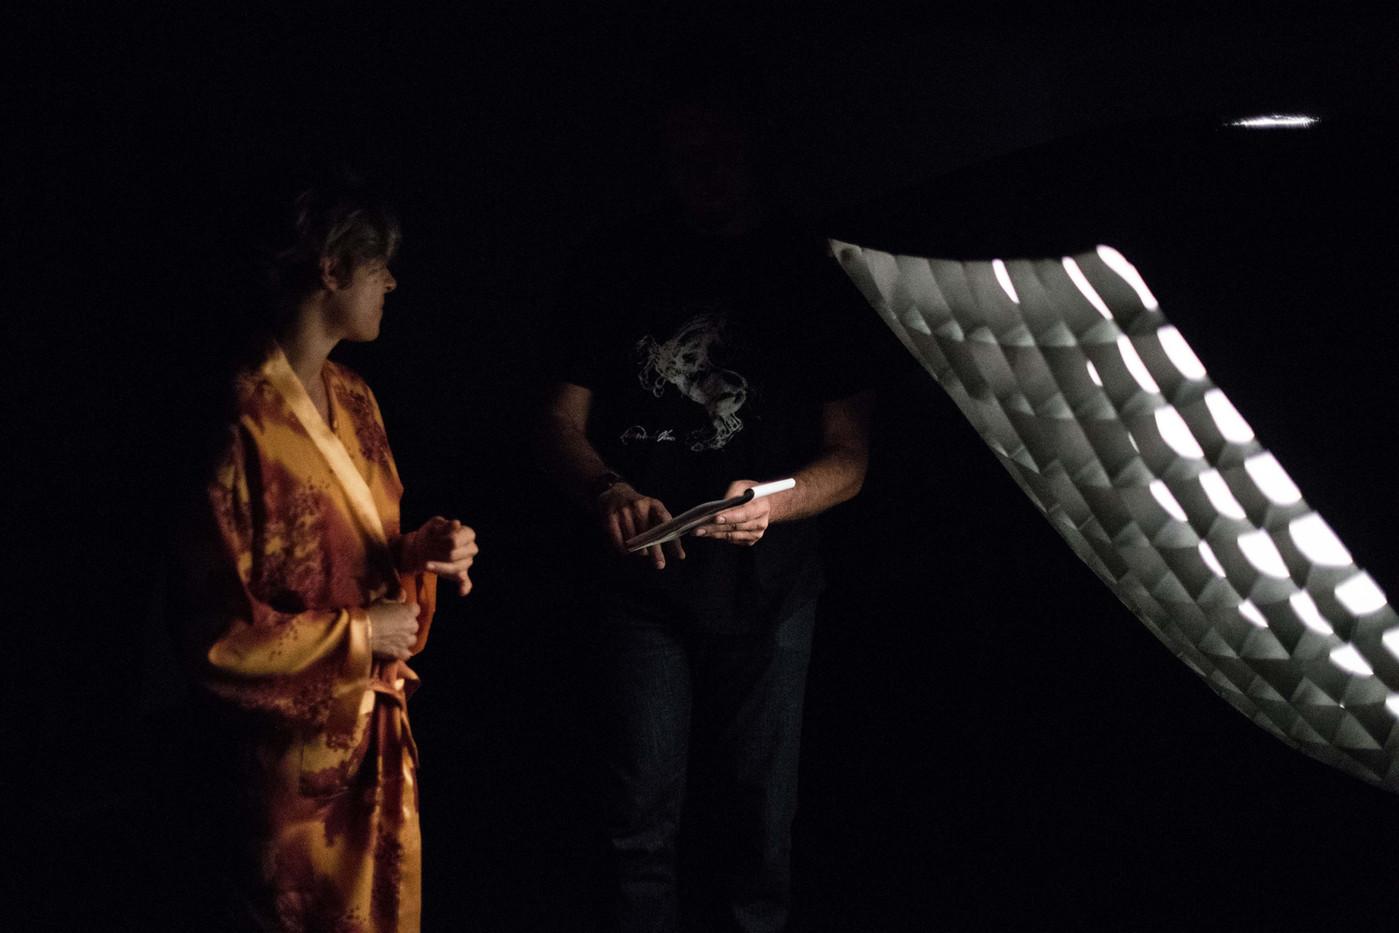 Livio Moiana backstage